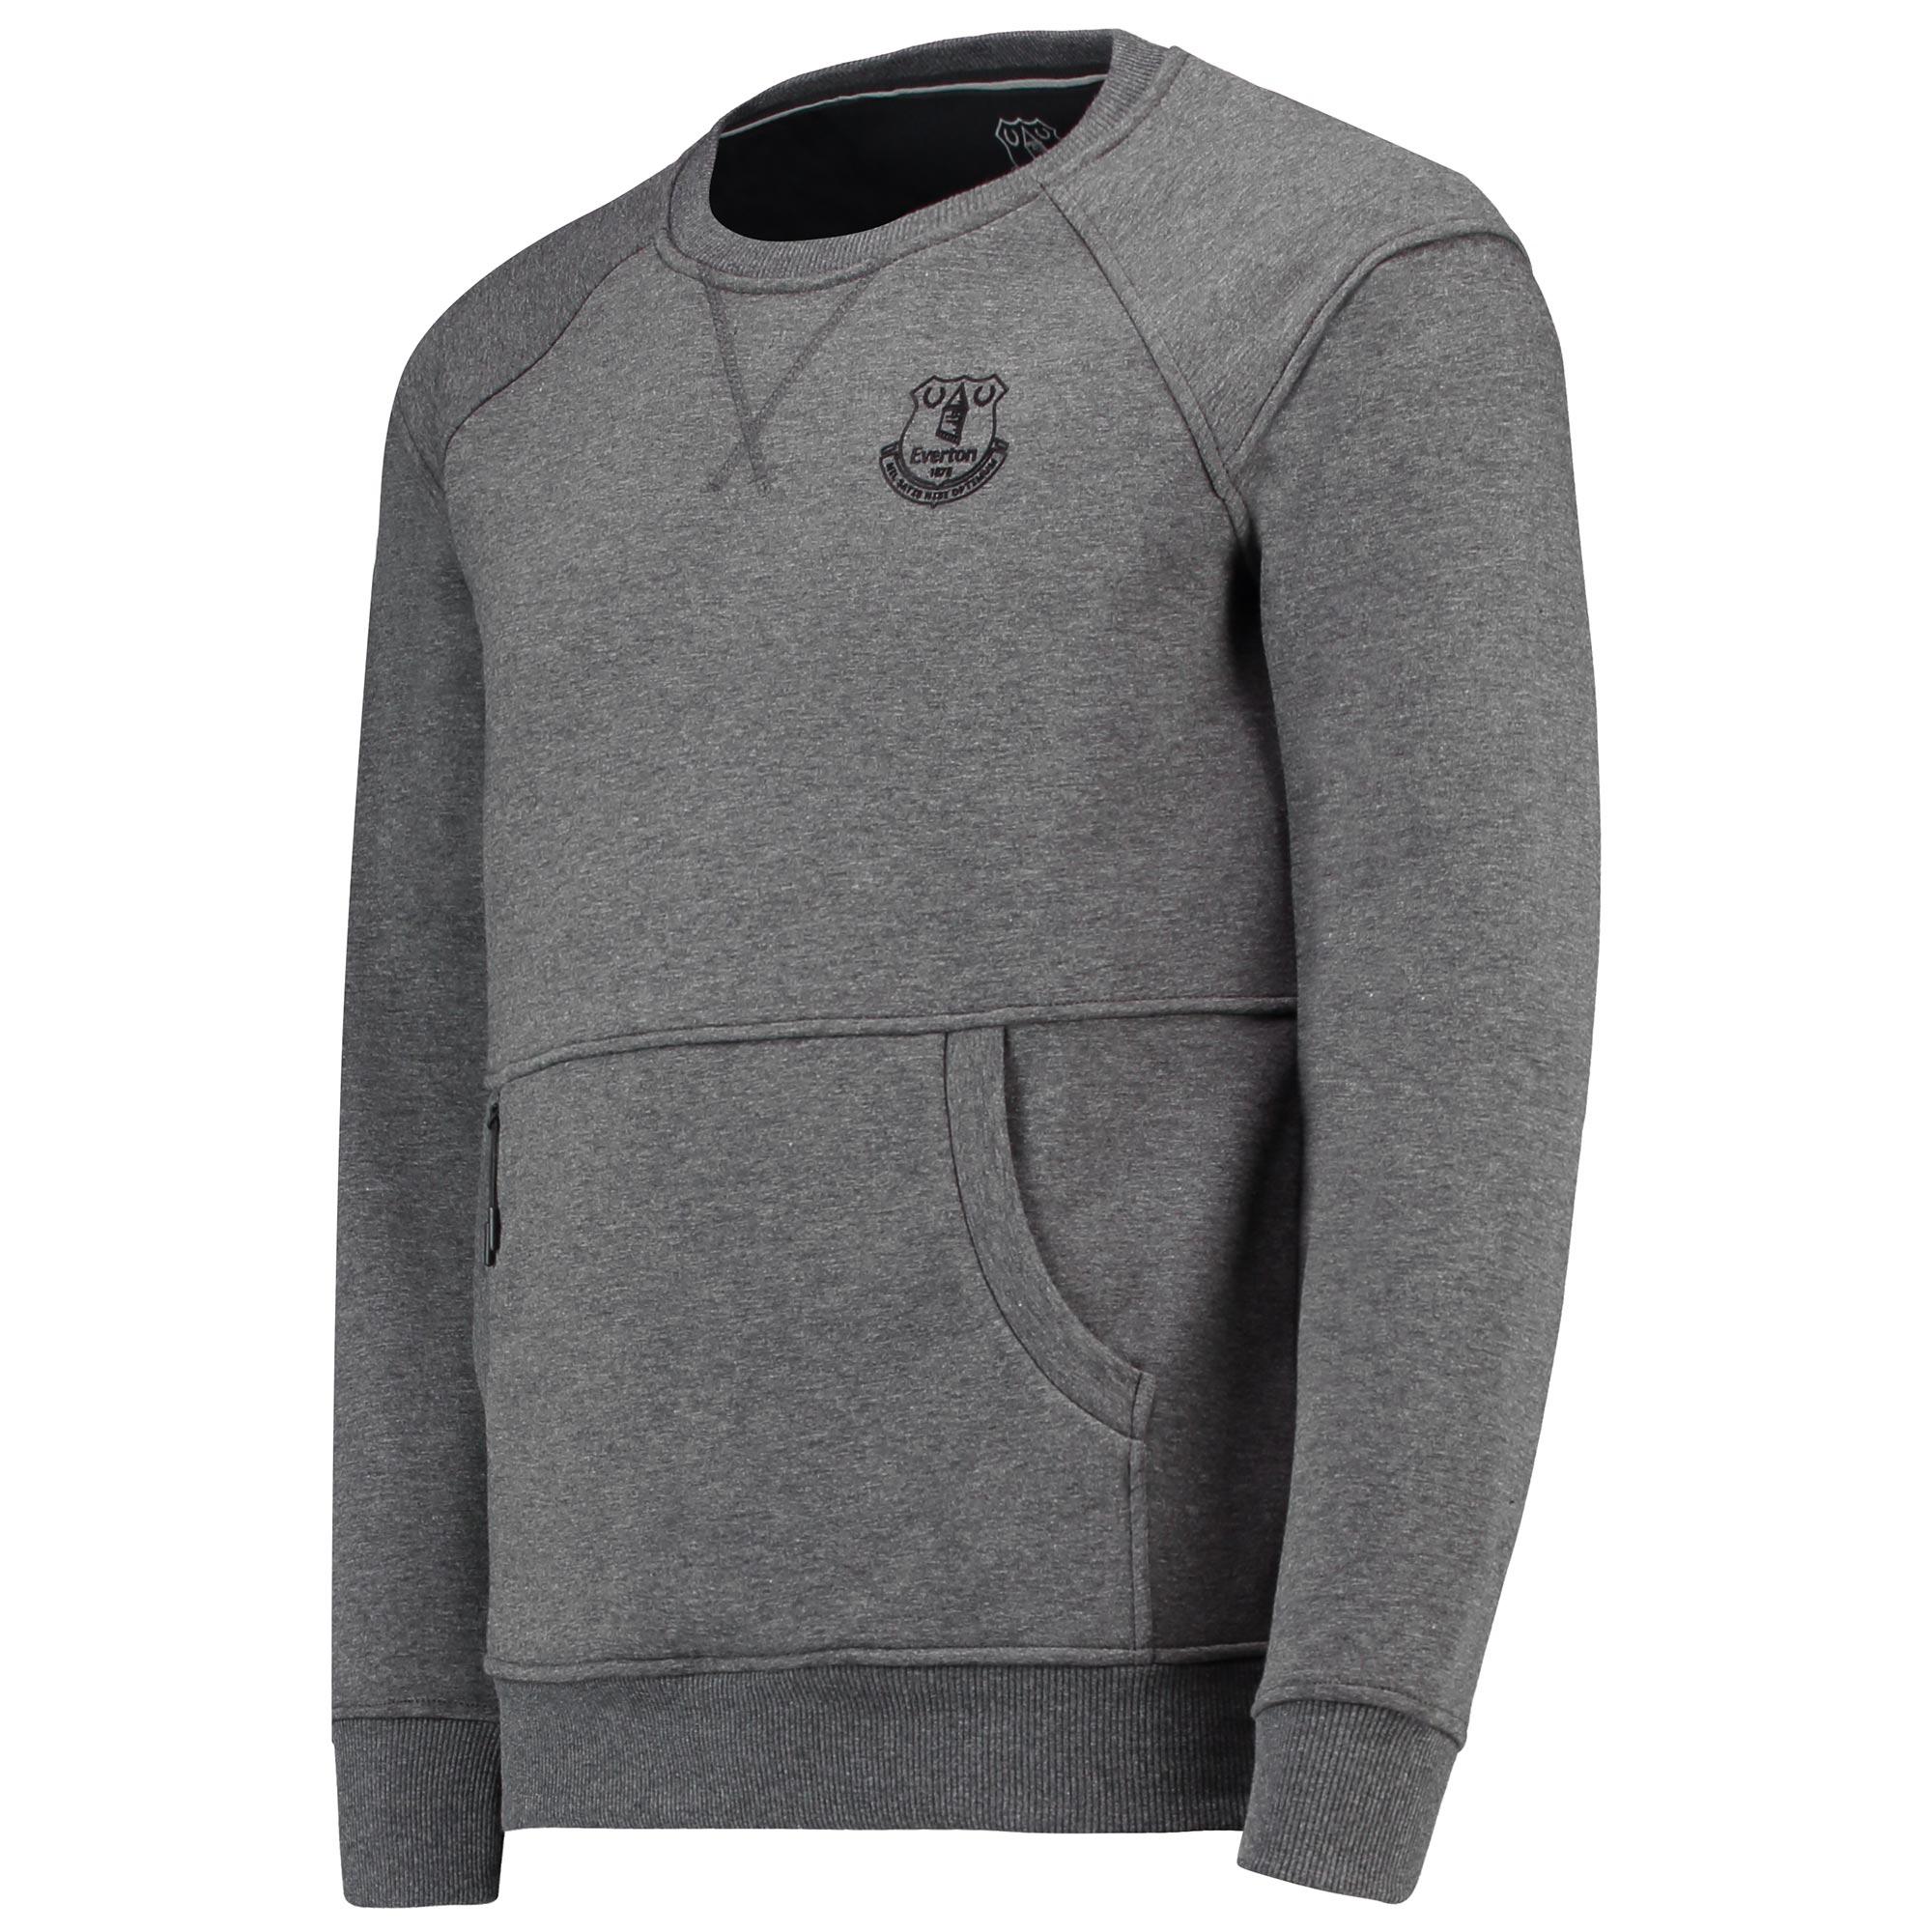 Image of Everton Ath Tech Fleece Sweater - Charcoal Marl